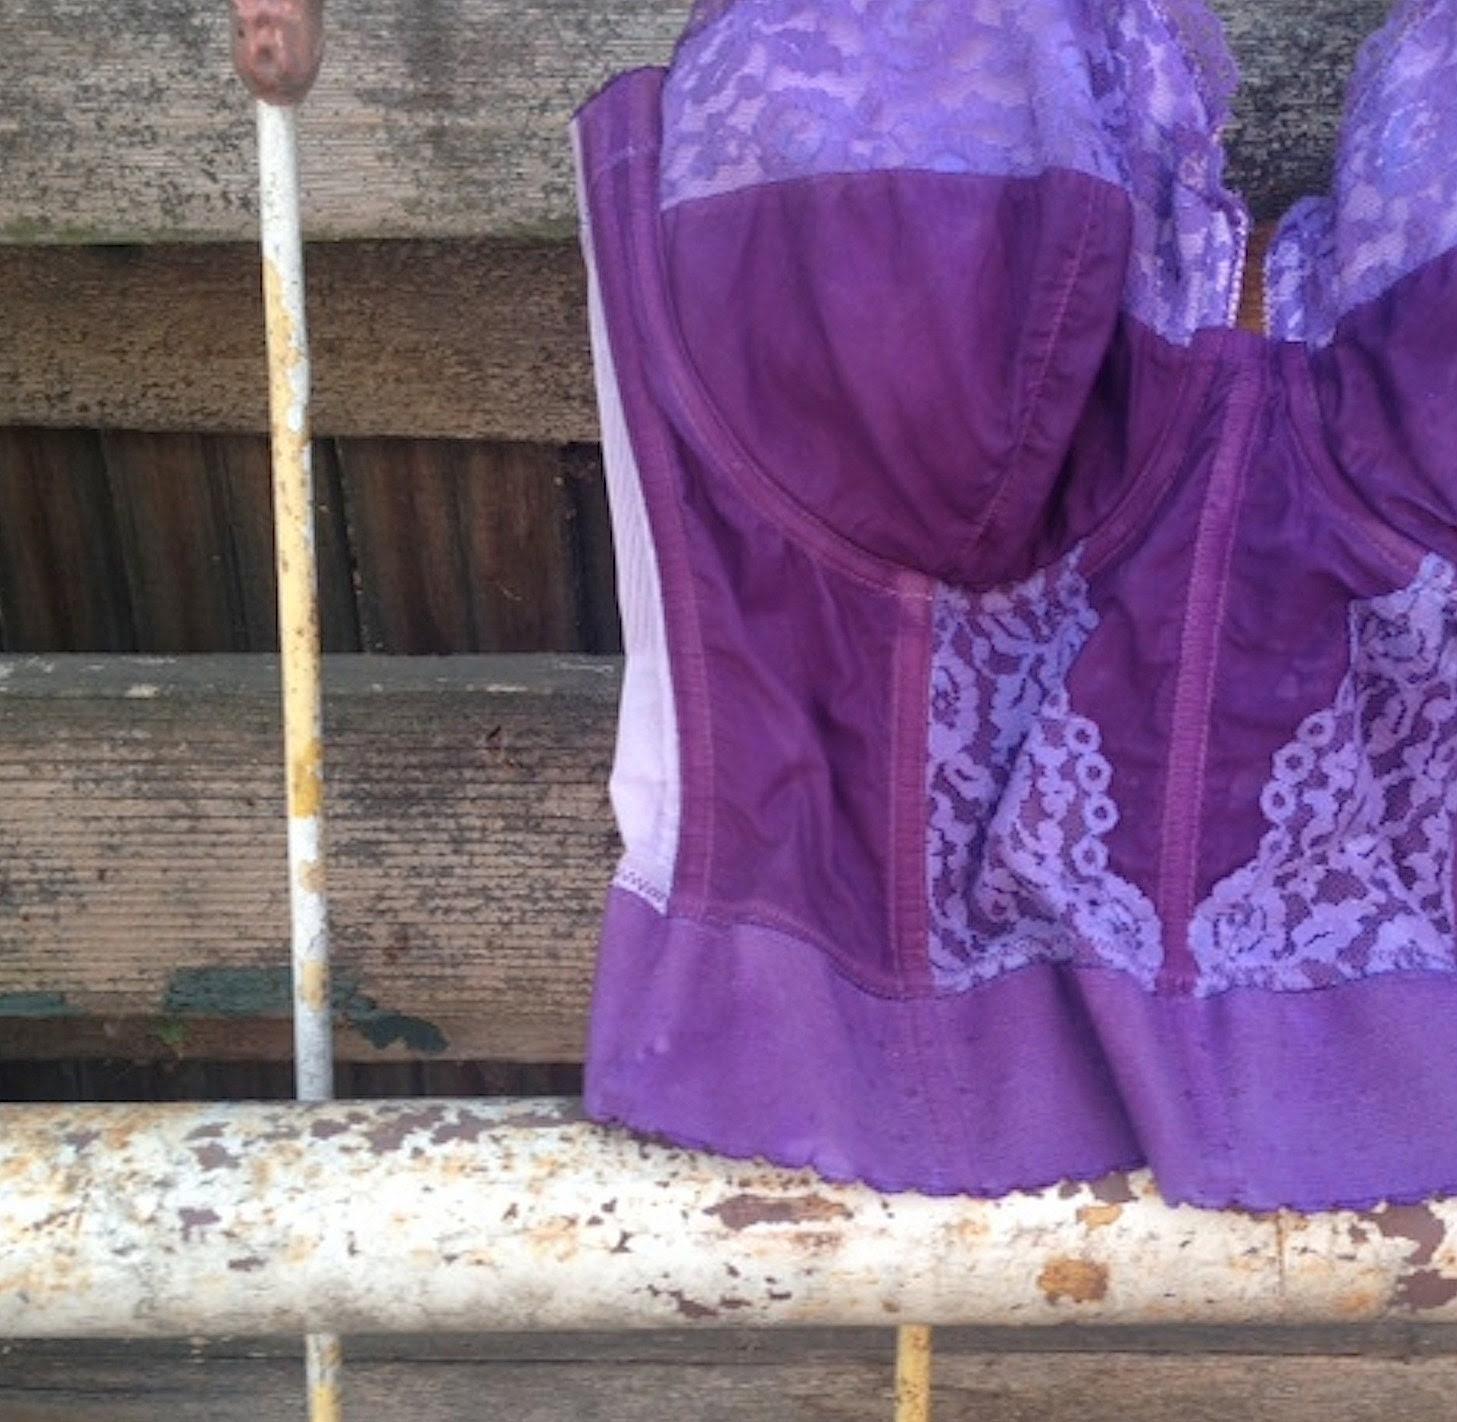 radiant orchid vintage lilac purple corset bustier valentine lover photo stylist decor boho anthropologie style bra shabby rustic lingerie - kateblossom